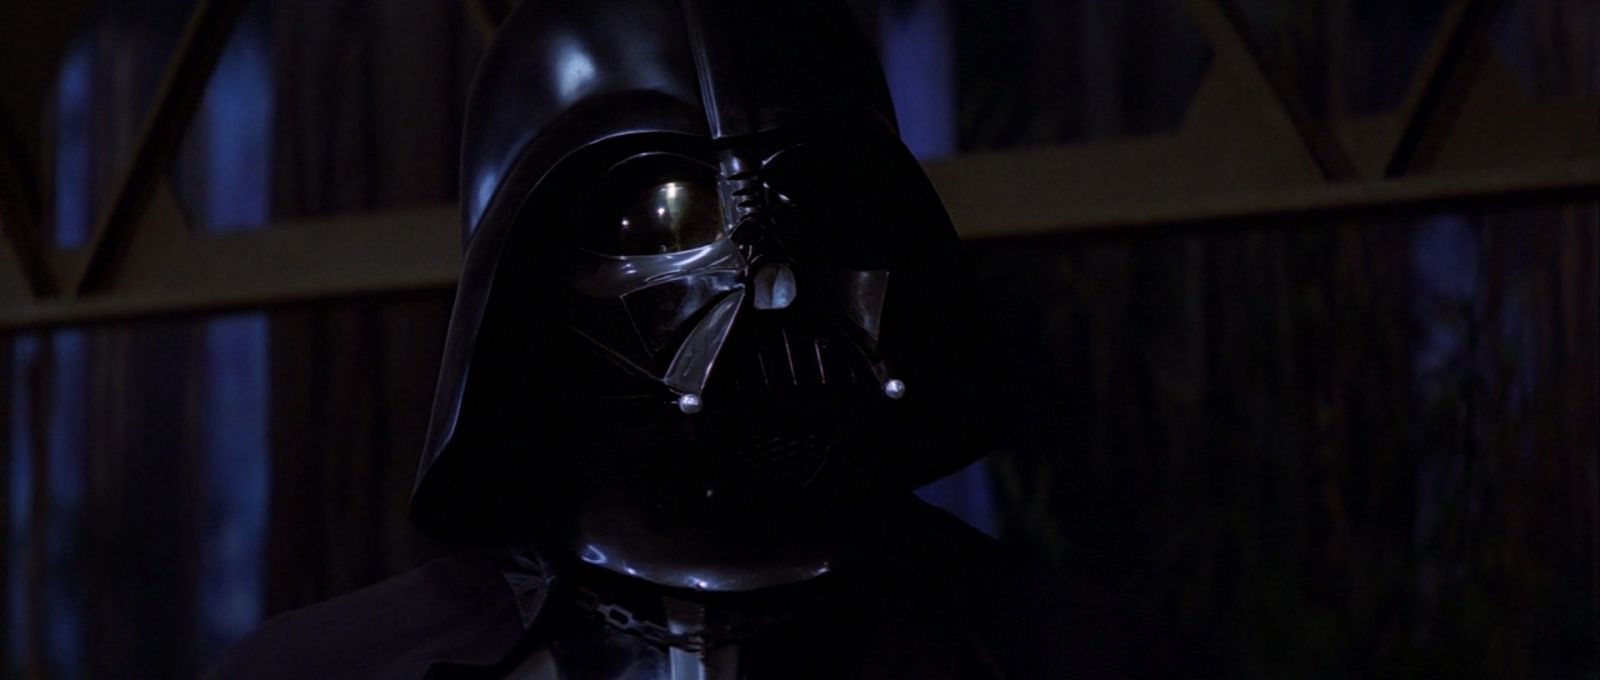 Armored Vader - ROTJ #1